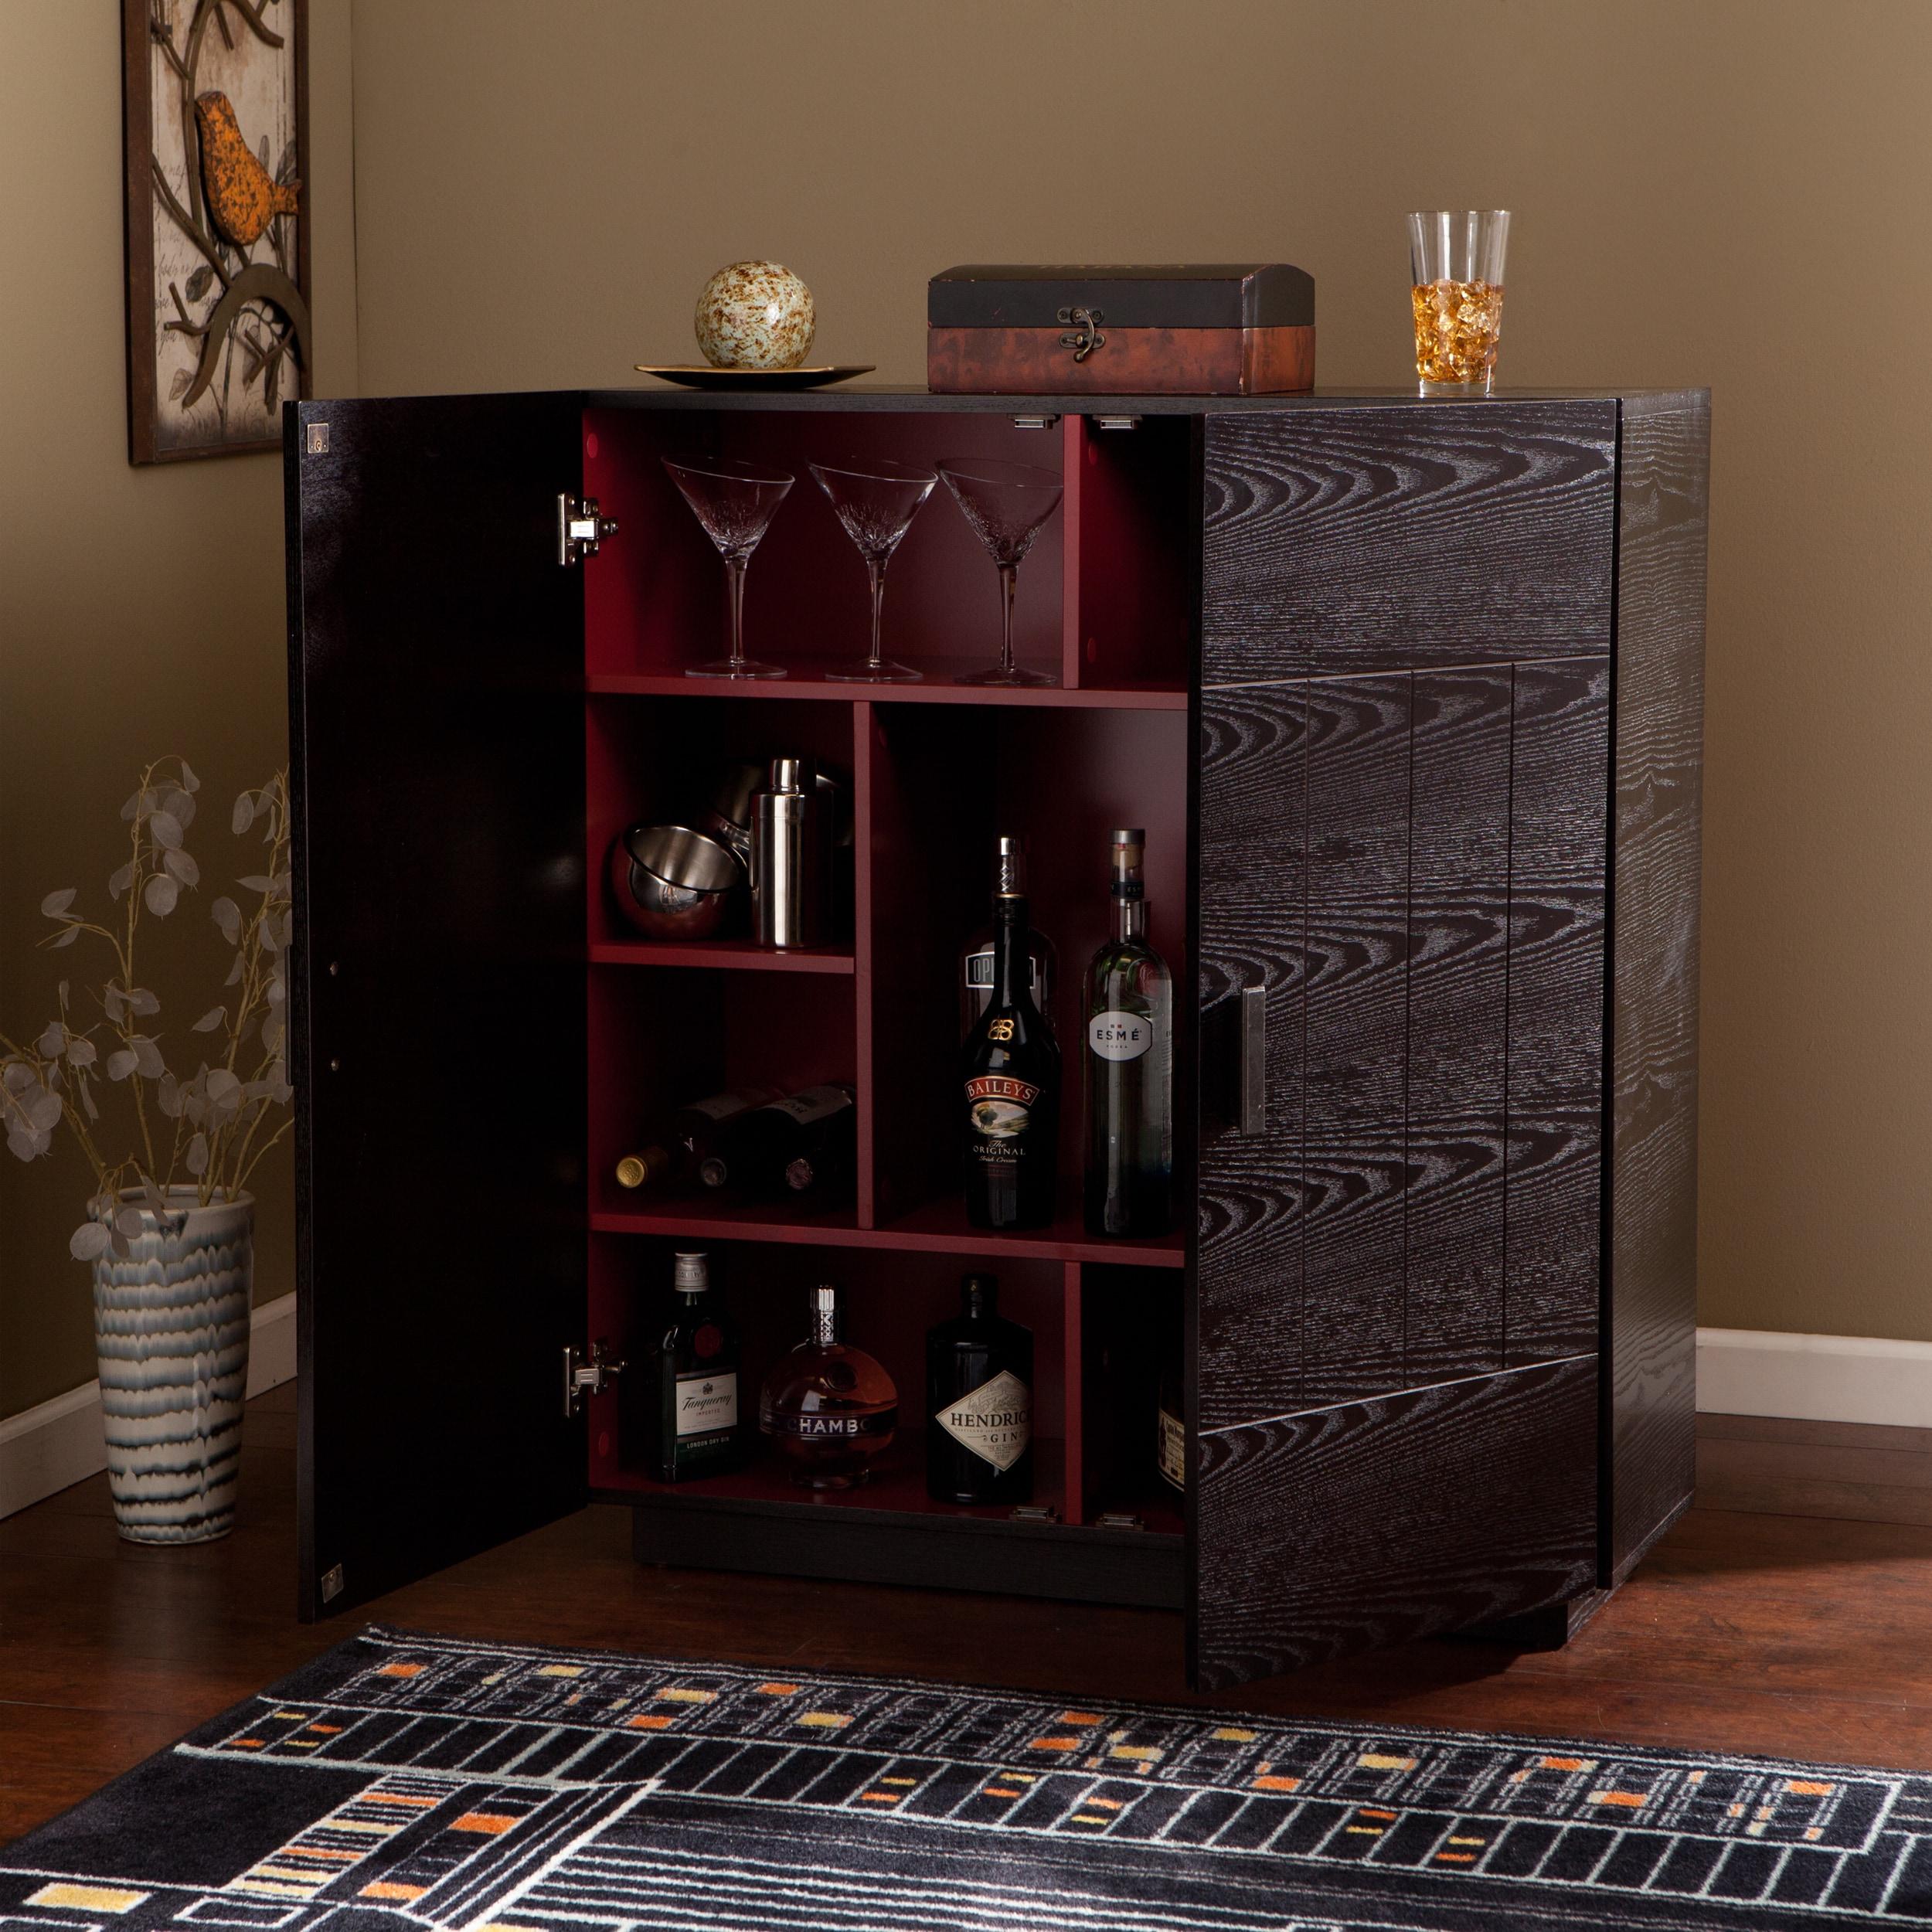 The Gray Barn Oriaga Ebony/Ruby Red Wood Bar Cabinet